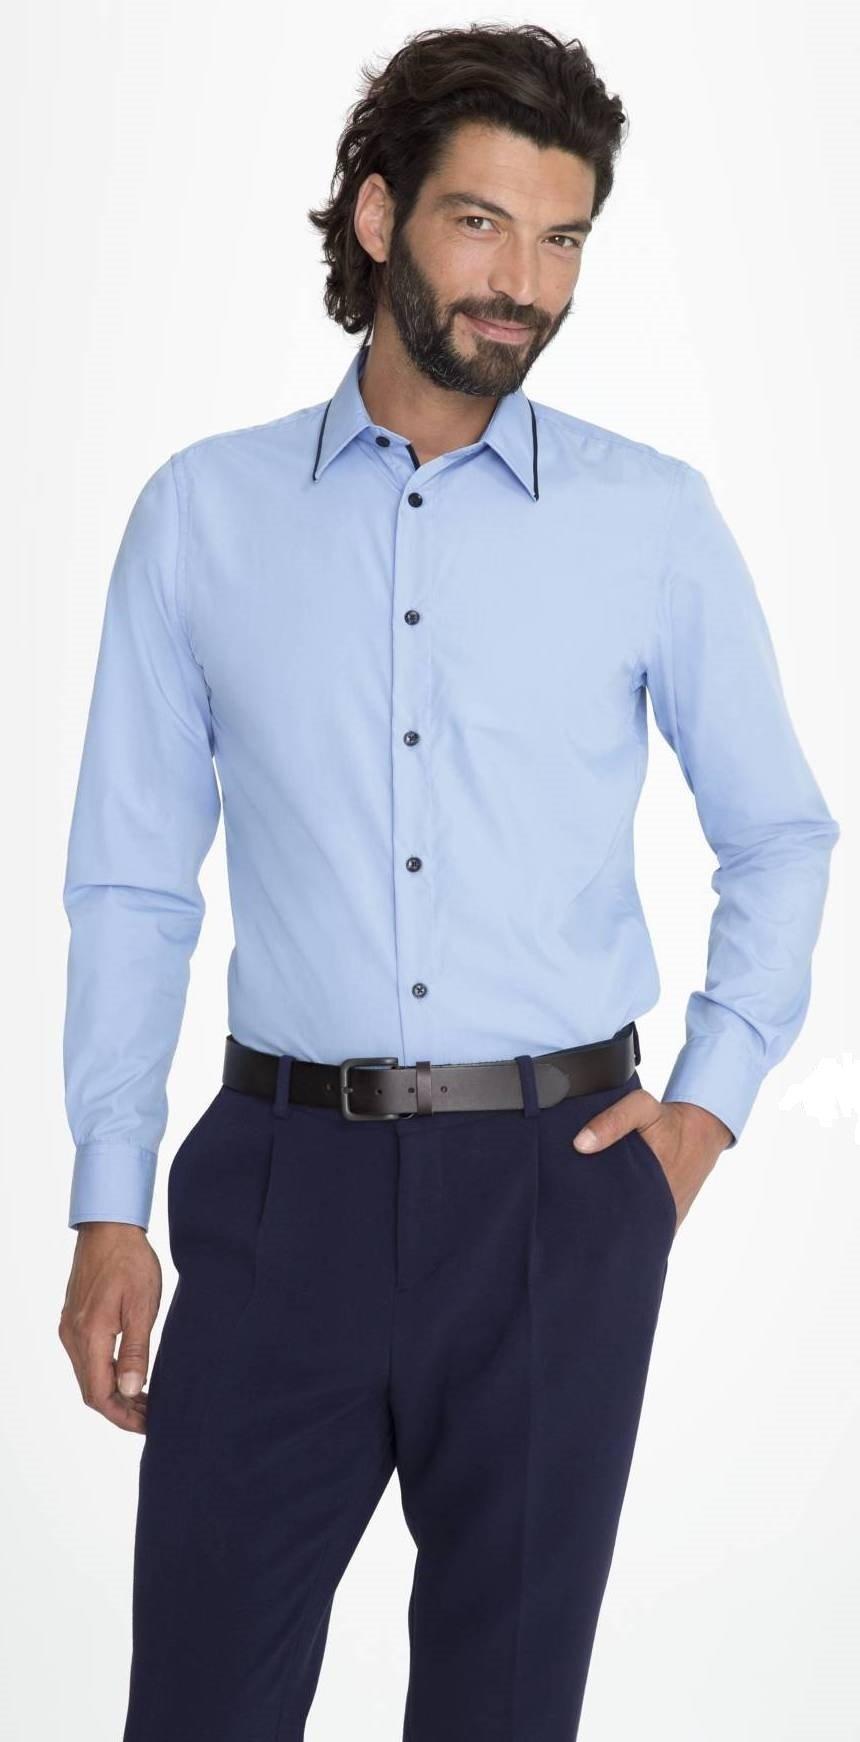 0c6428b29343 Sol s Baxter men 00567 Ανδρικό μακρυμάνικο πουκάμισο σε στενή γραμμή